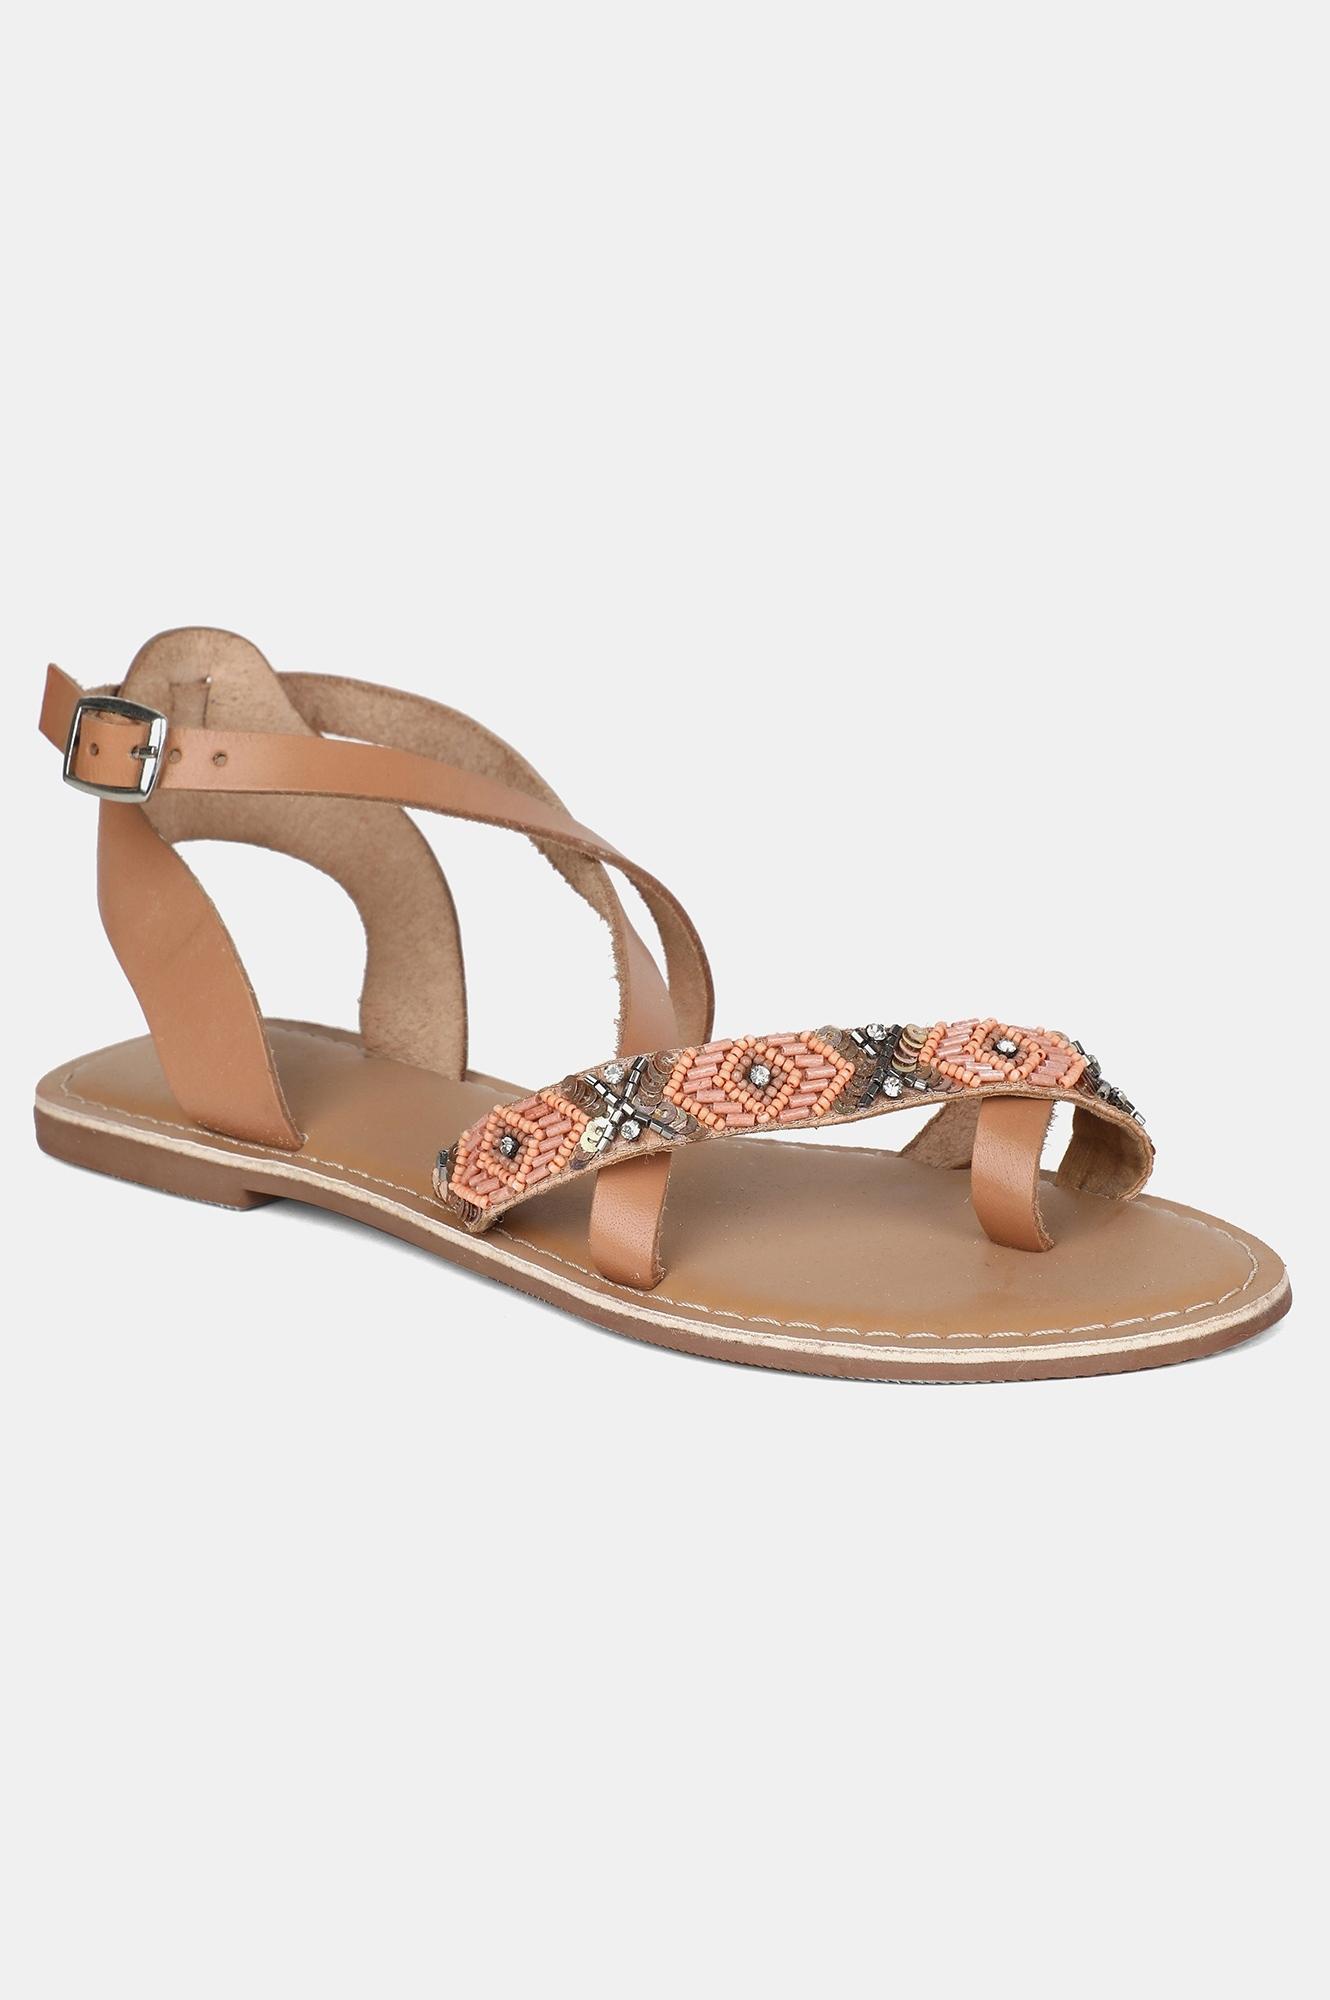 W | W Peach Almond Toe Embroidered Flat